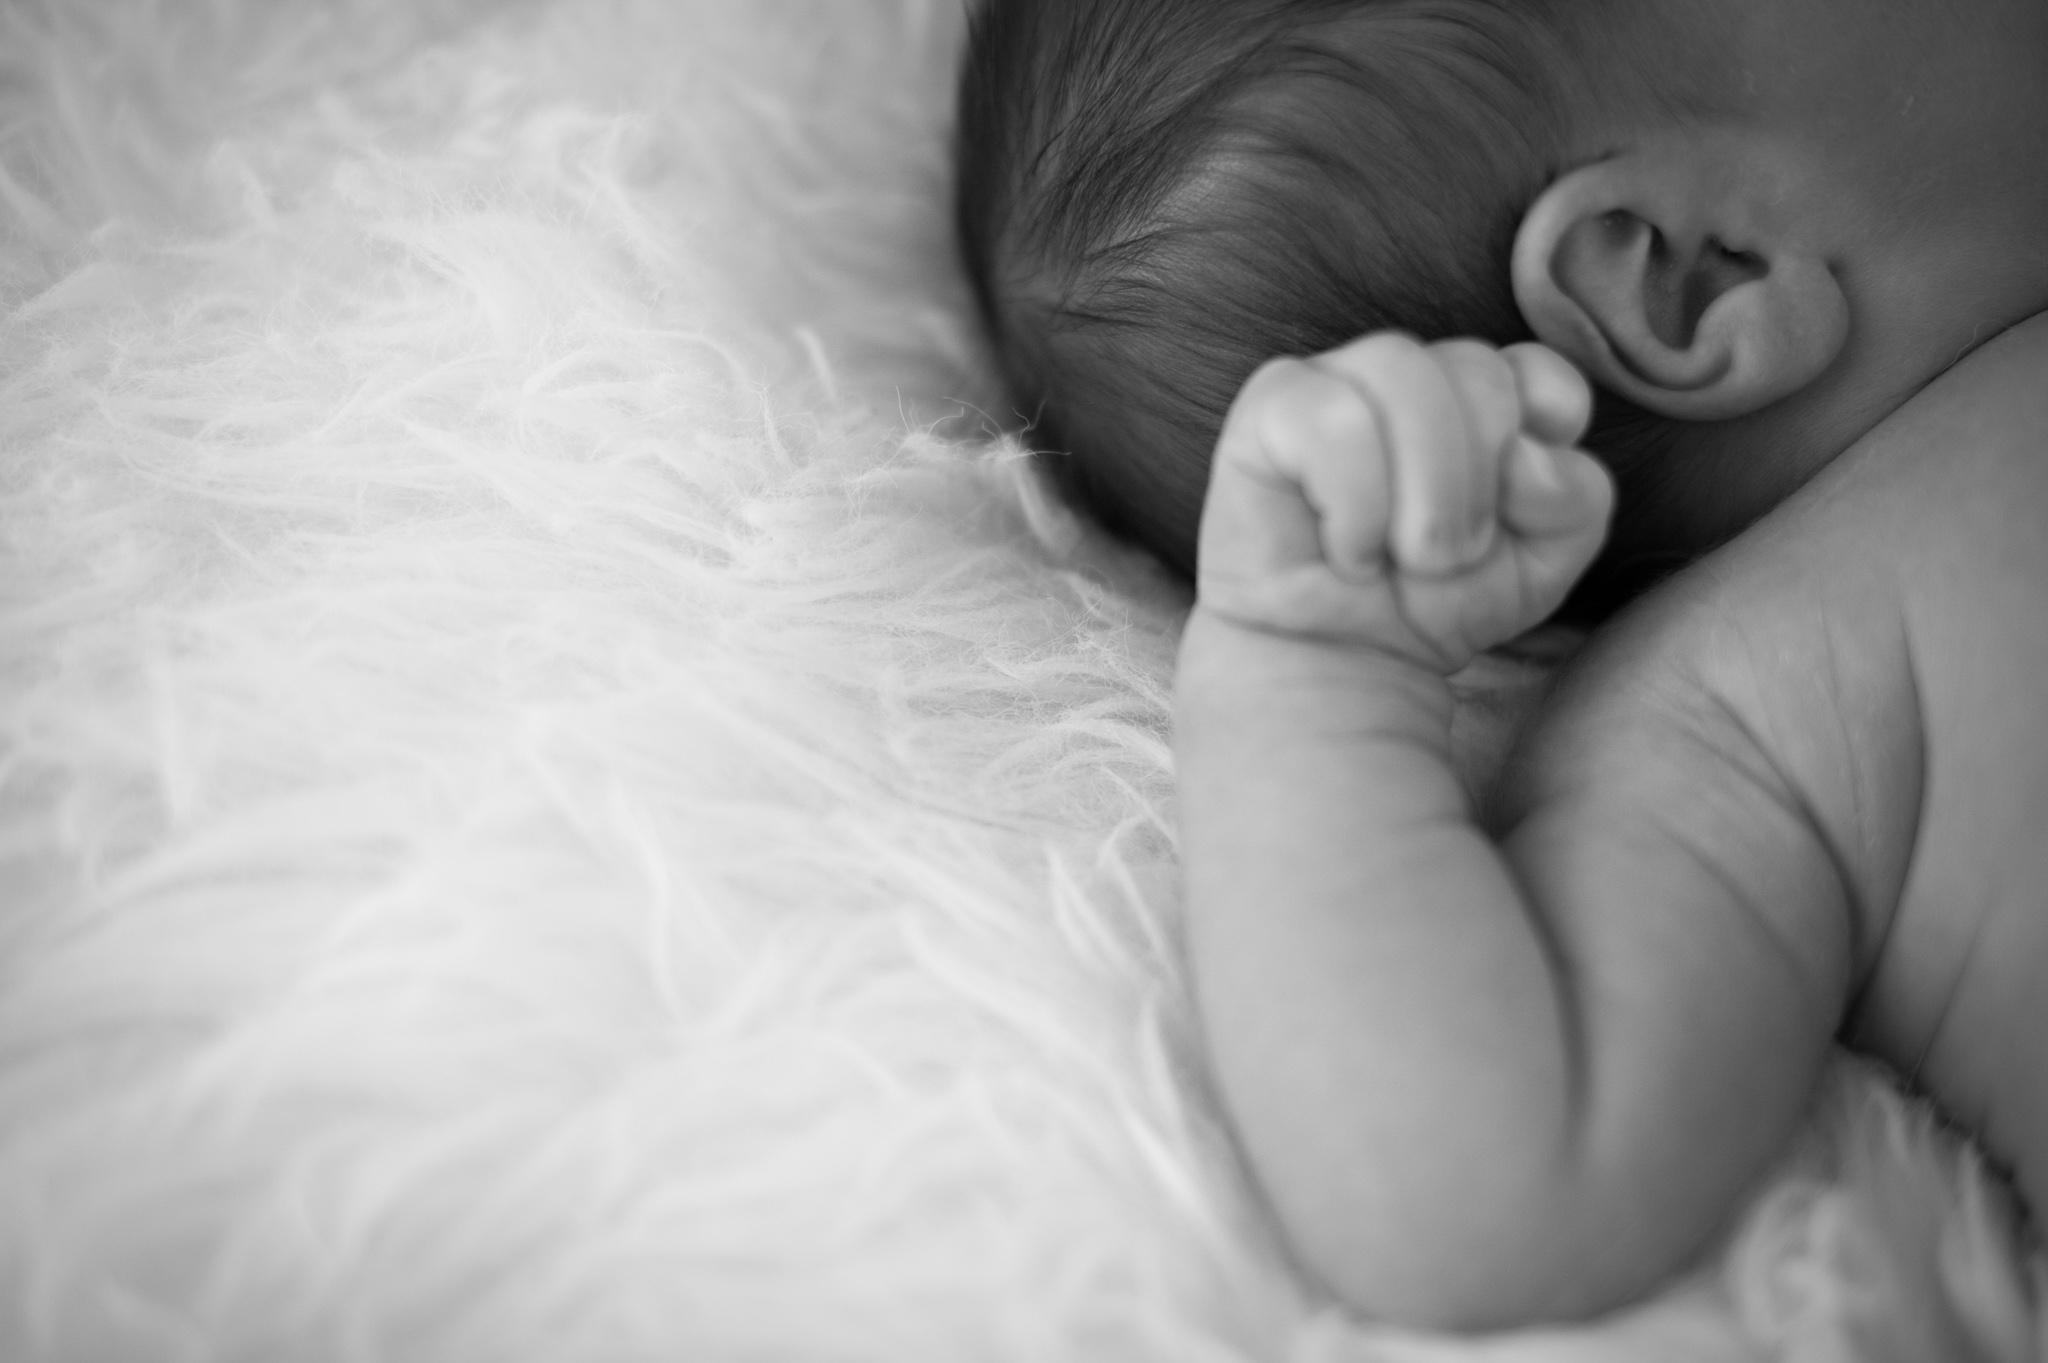 newborn baby detail images